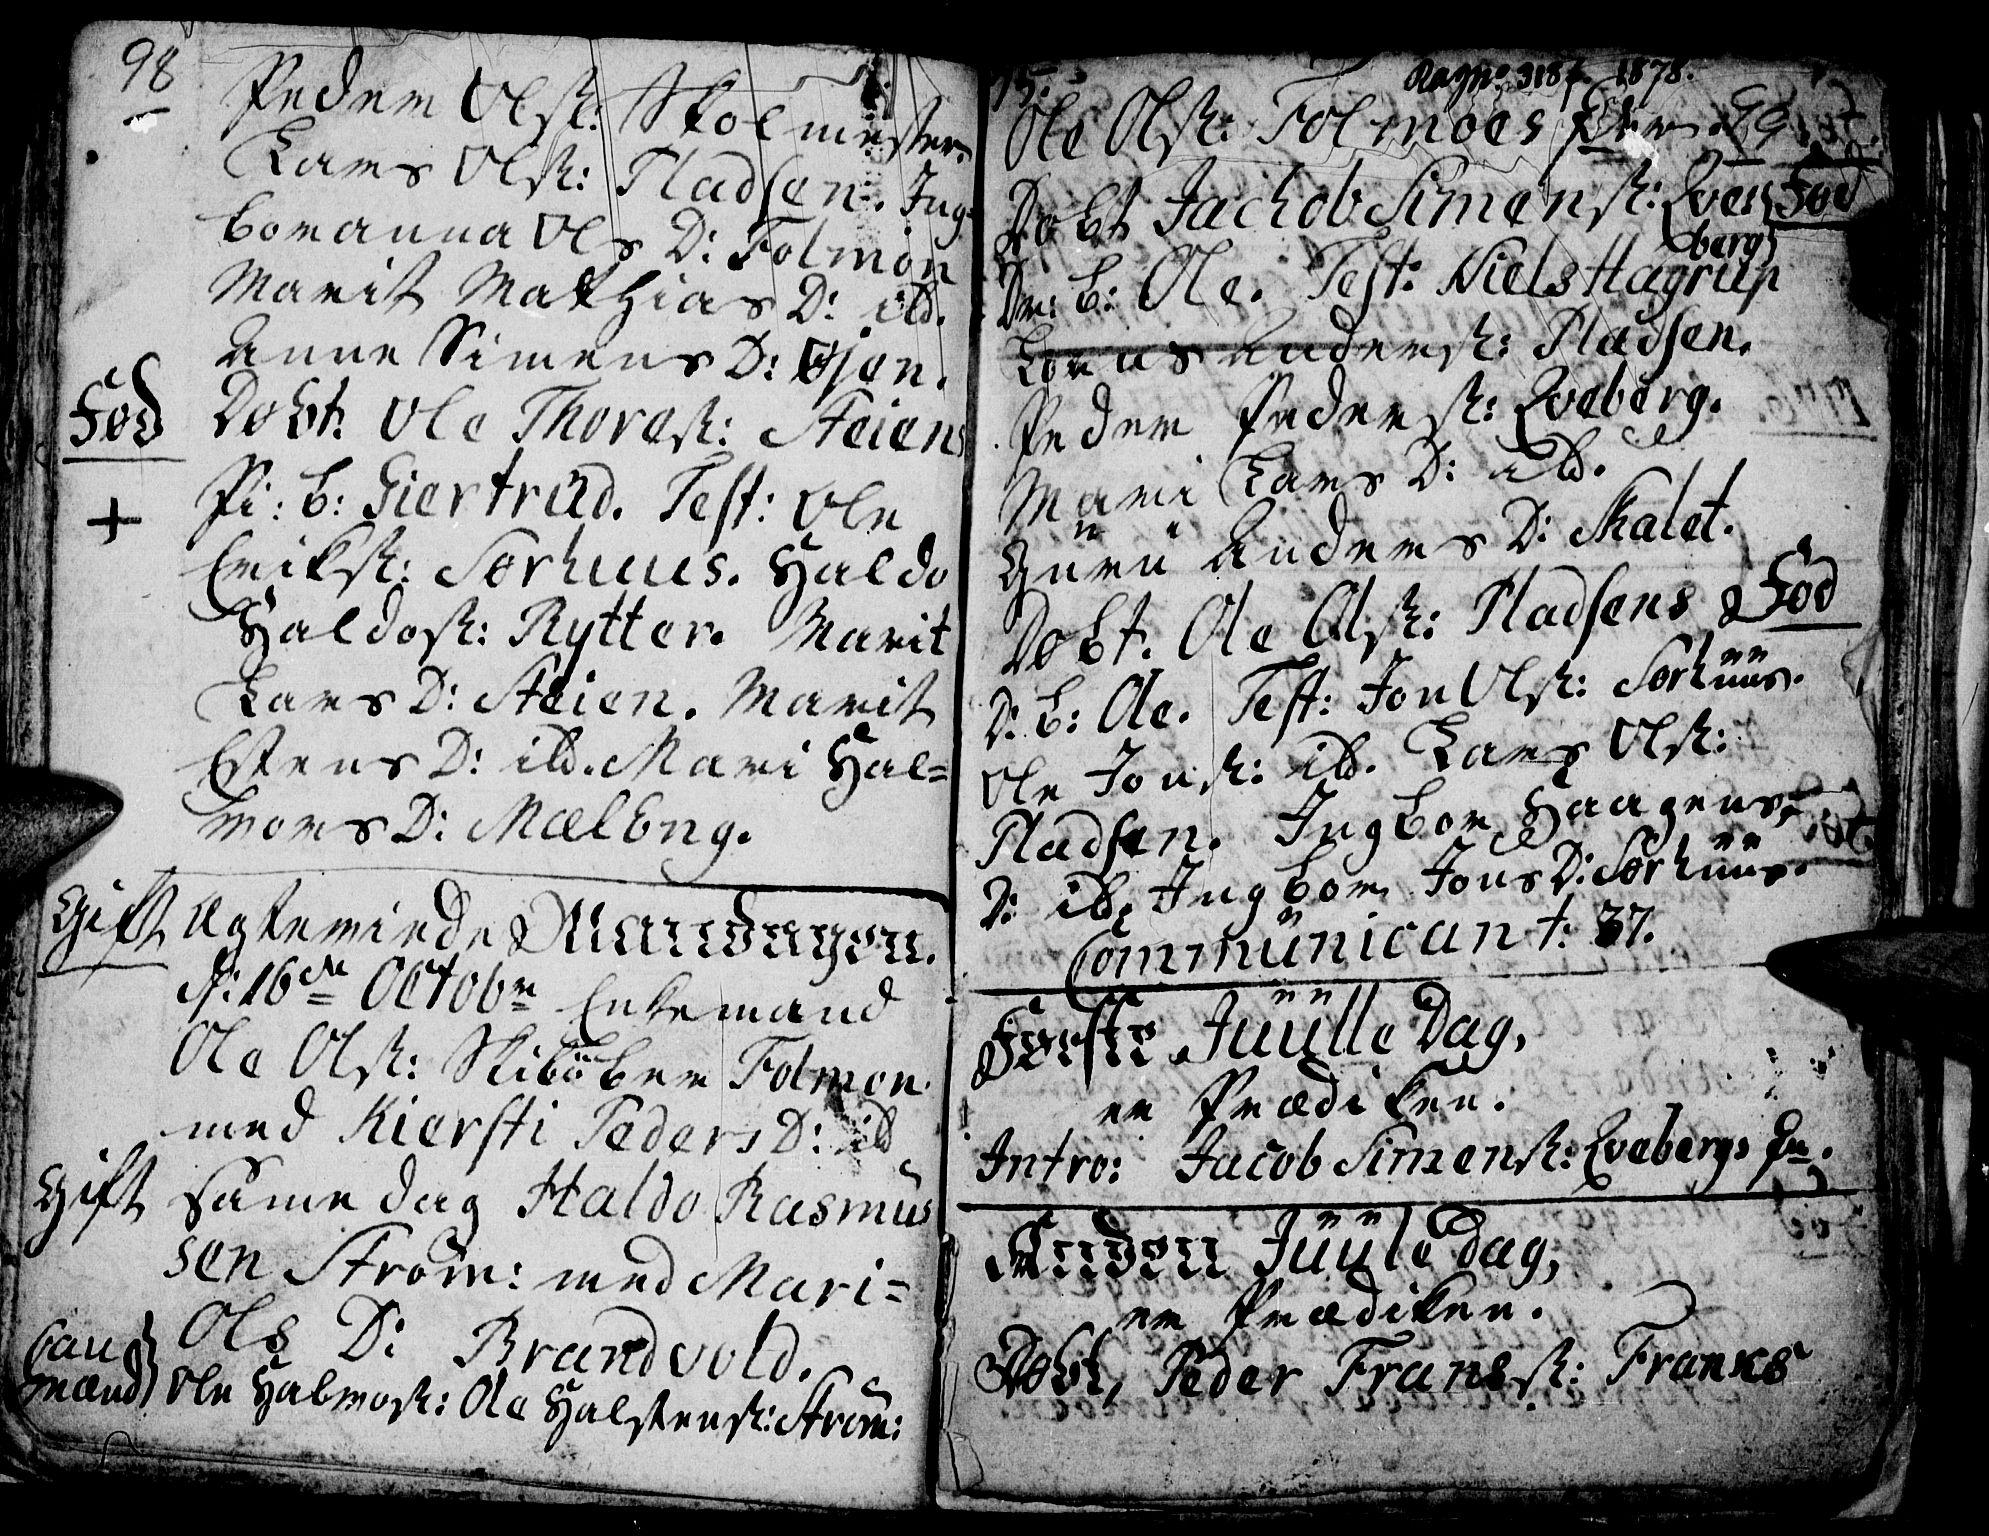 SAH, Tynset prestekontor, Ministerialbok nr. 9, 1769-1781, s. 98-99